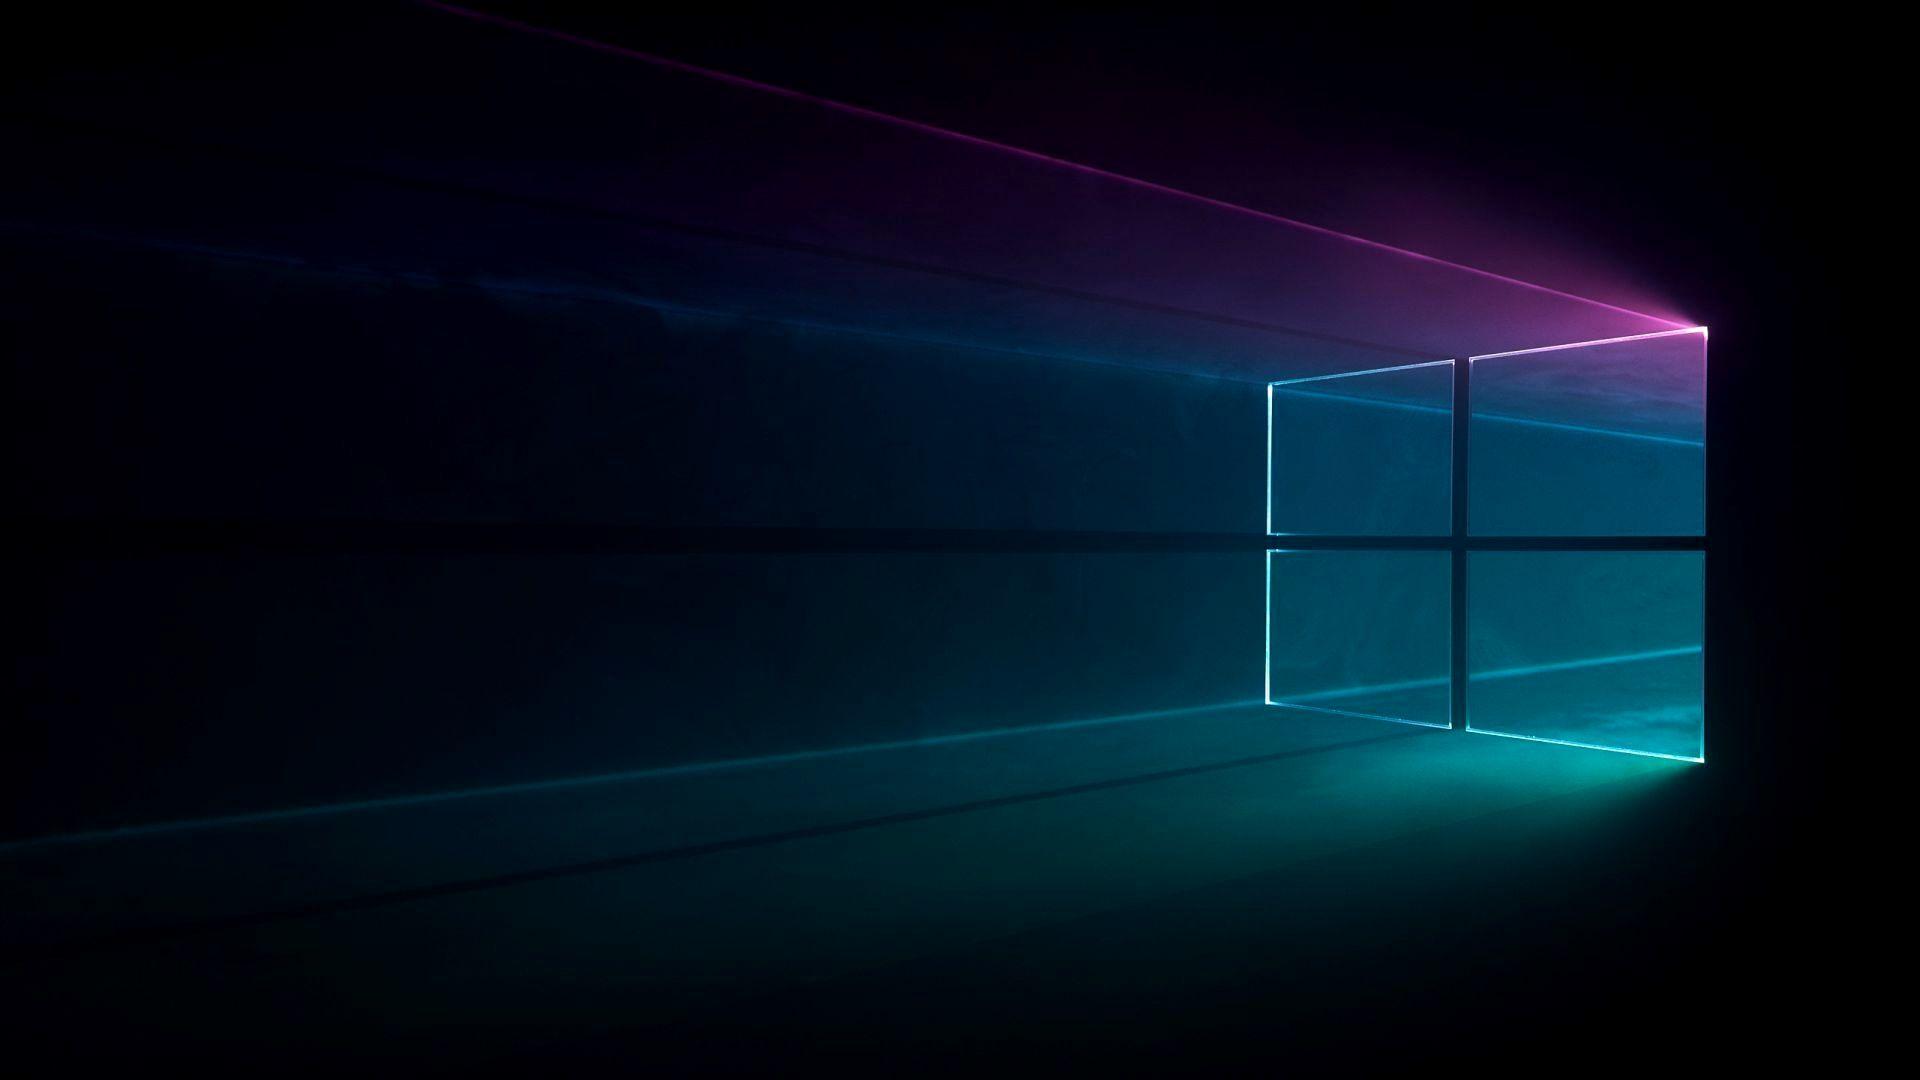 Wallpaper Hd 4k Windows 10 Gallery Fotografi Fotografi Pasangan